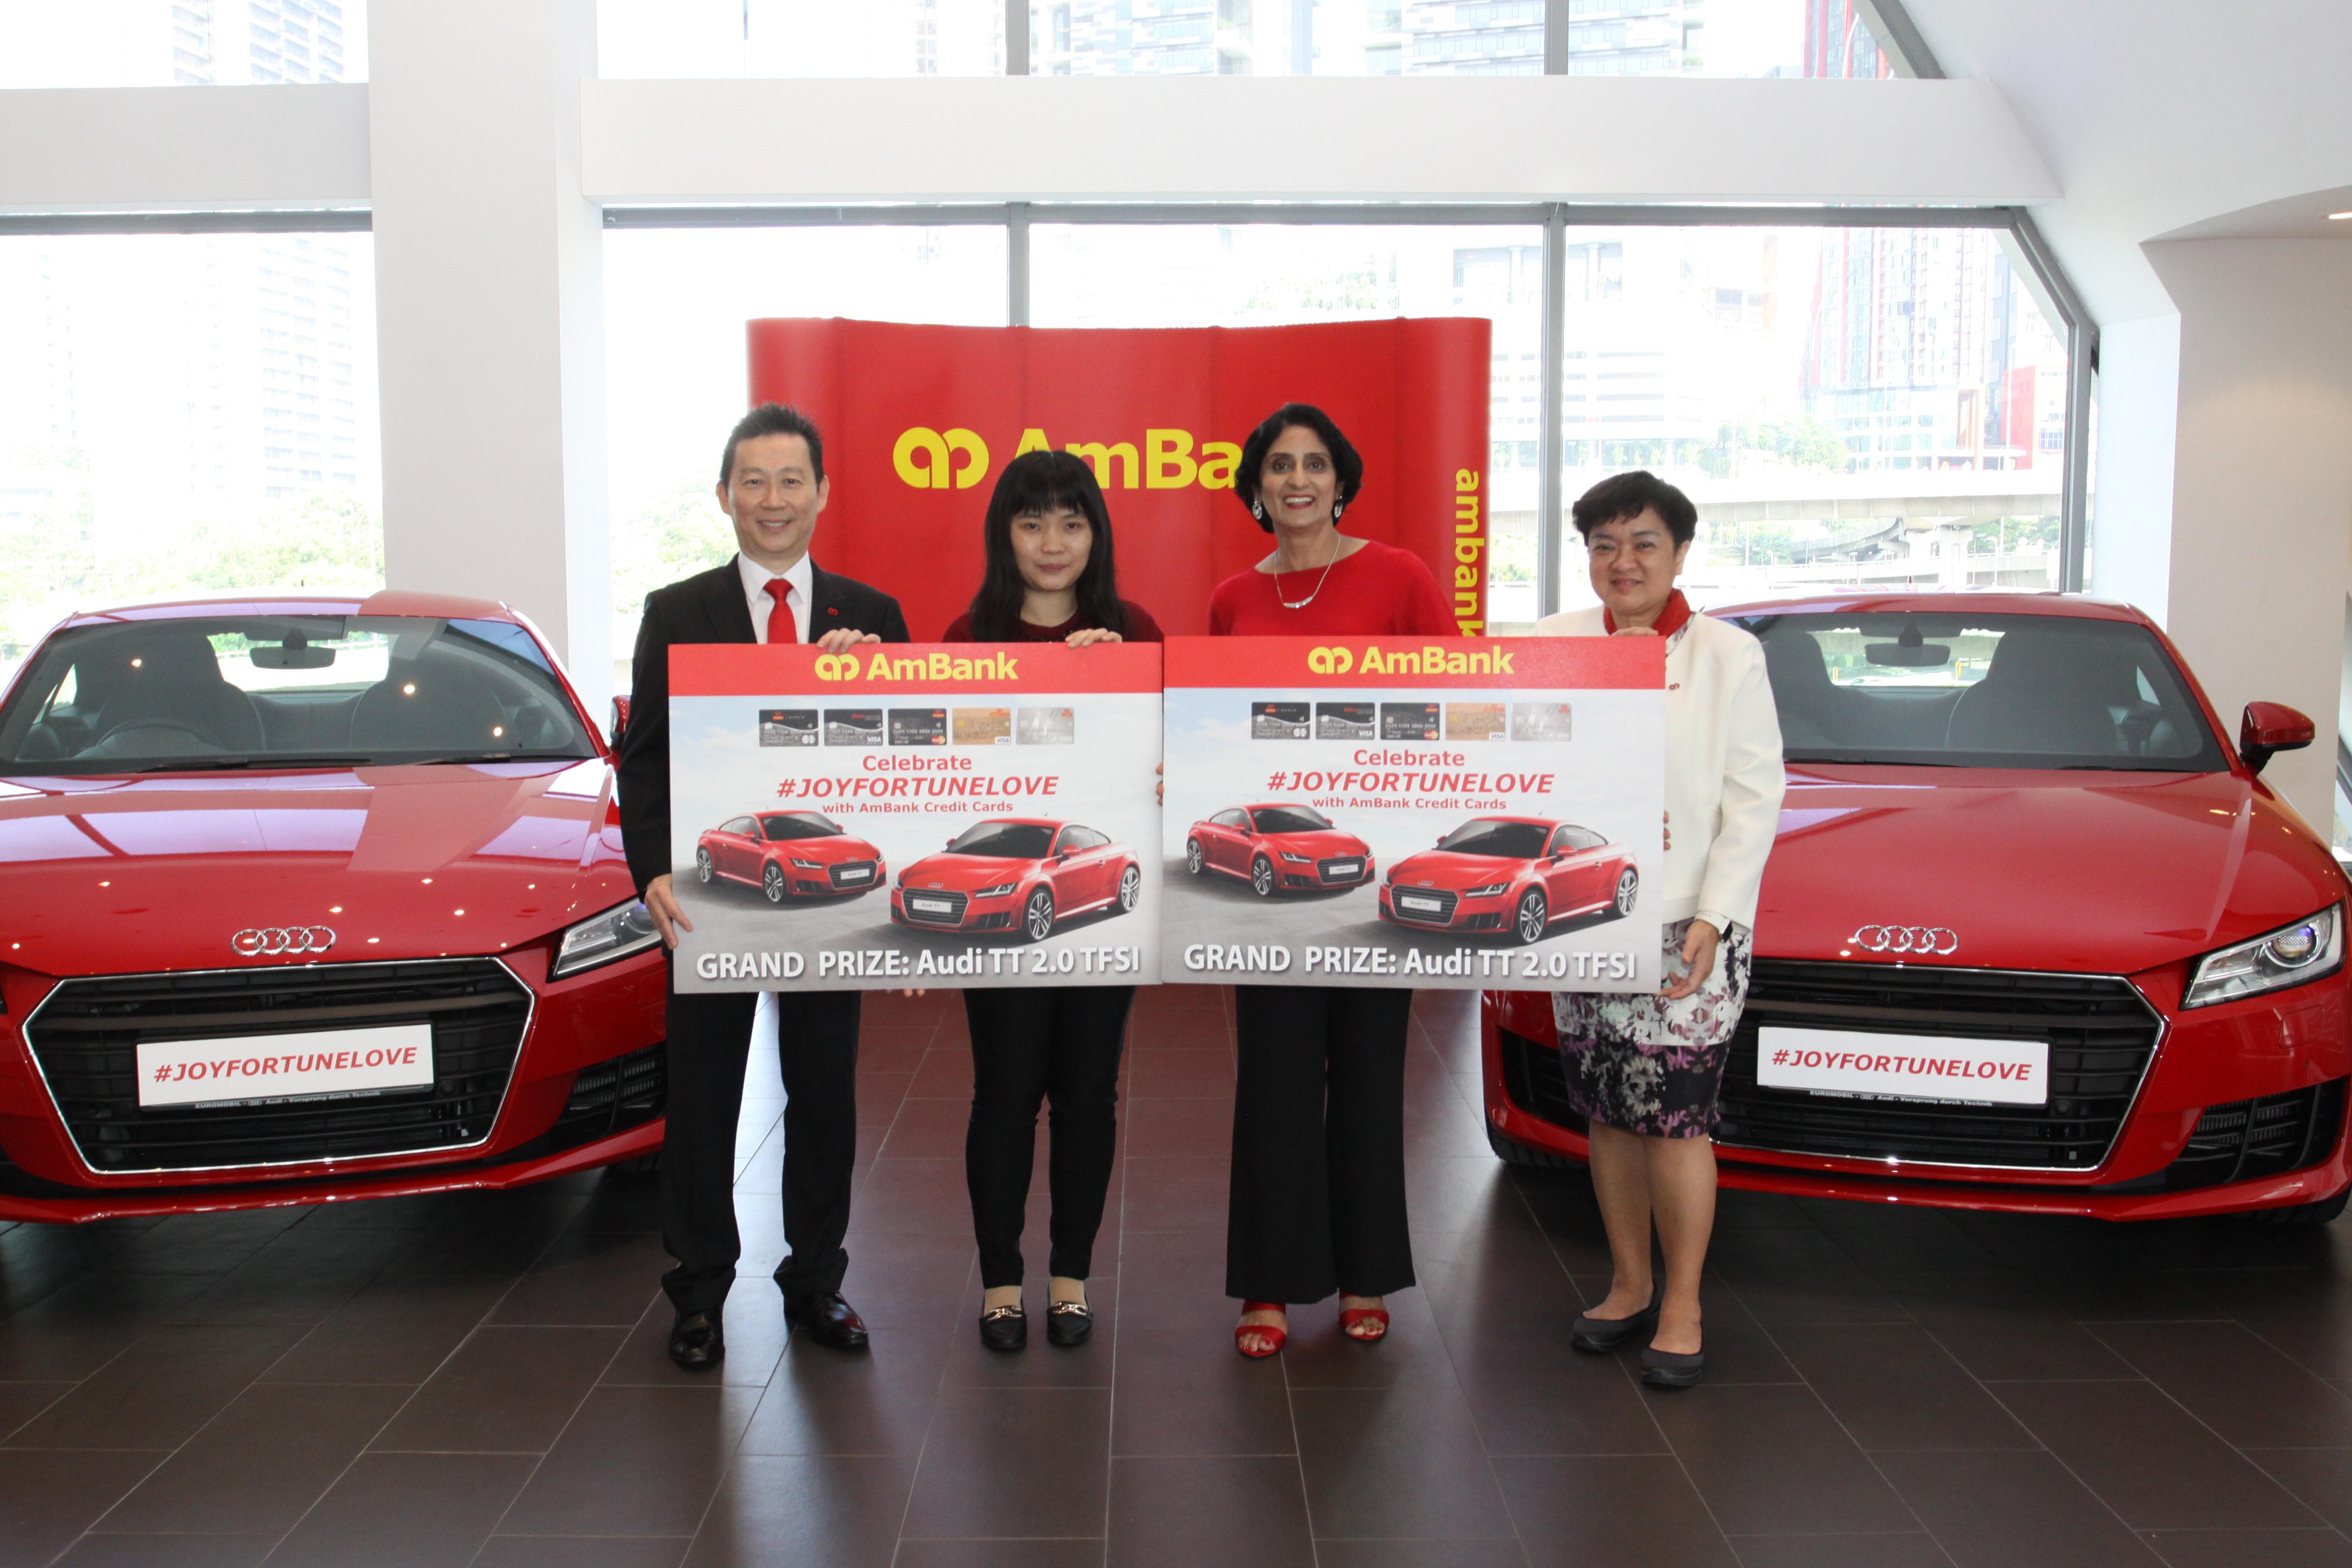 Ambank Rewards Two Grand Prize Winners Of The Joyfortunelove